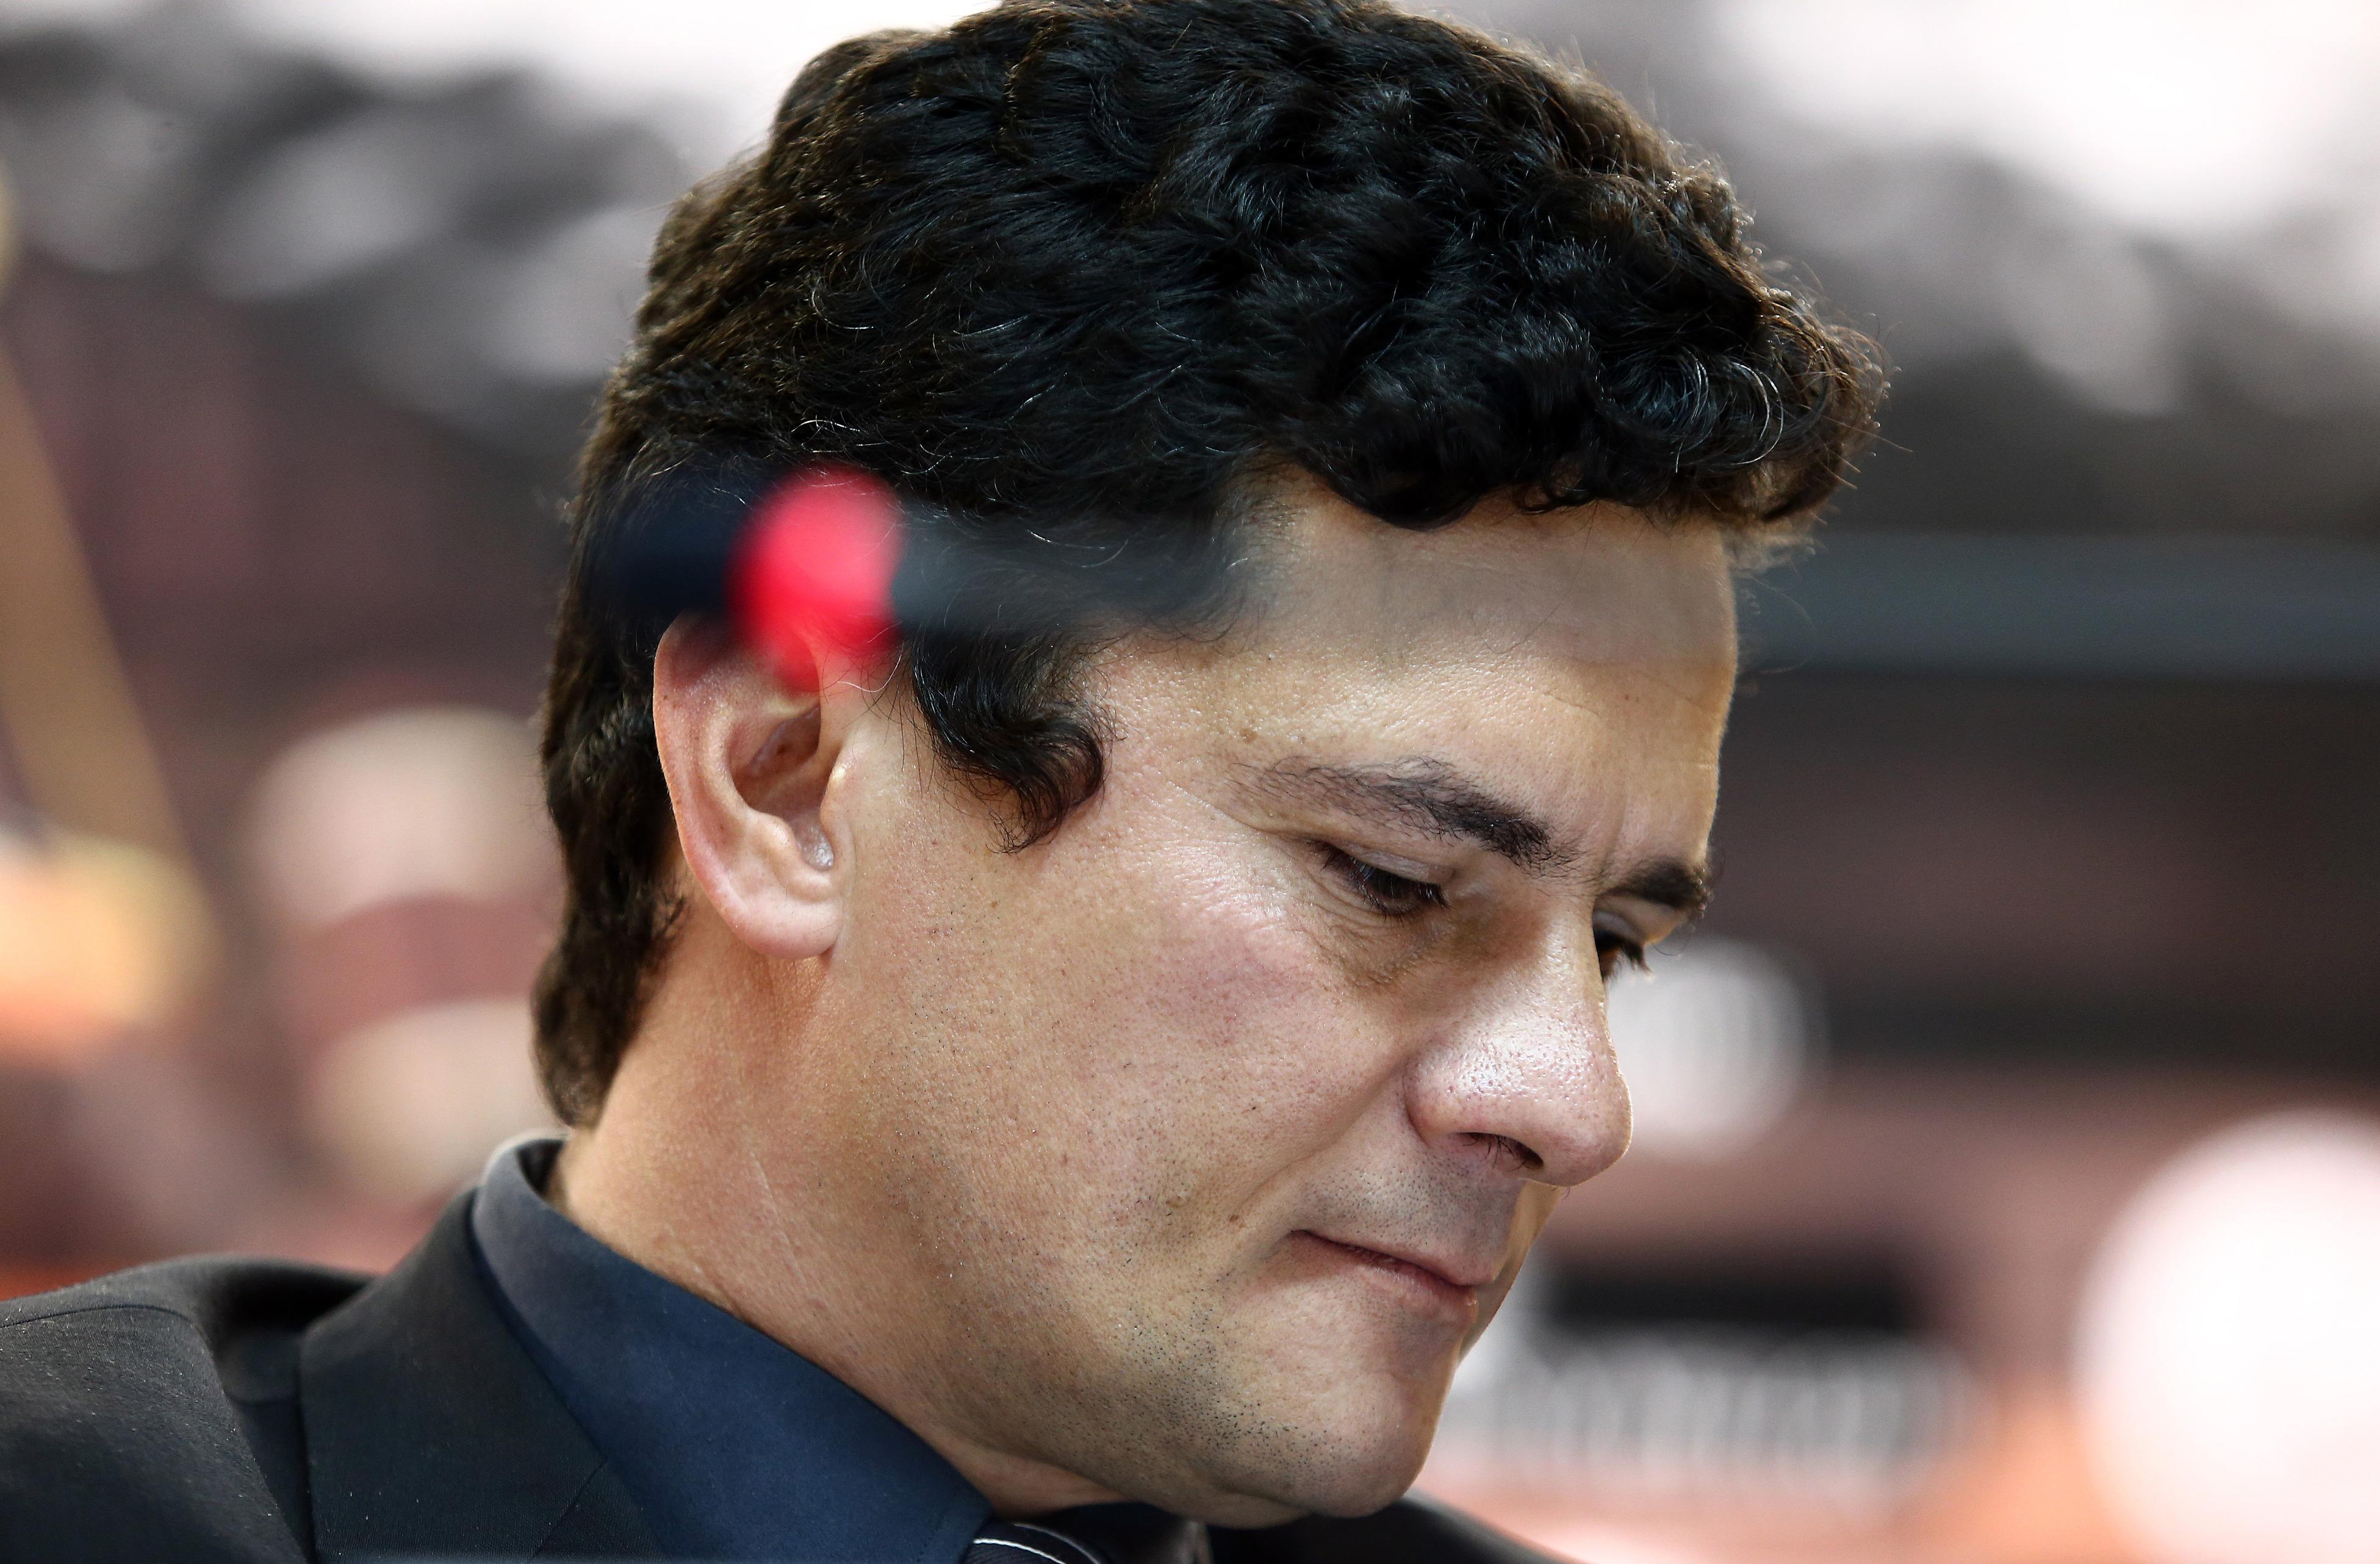 "Em nova arbitrariedade, Moro ""privatiza"" provas da Lava-Jato"